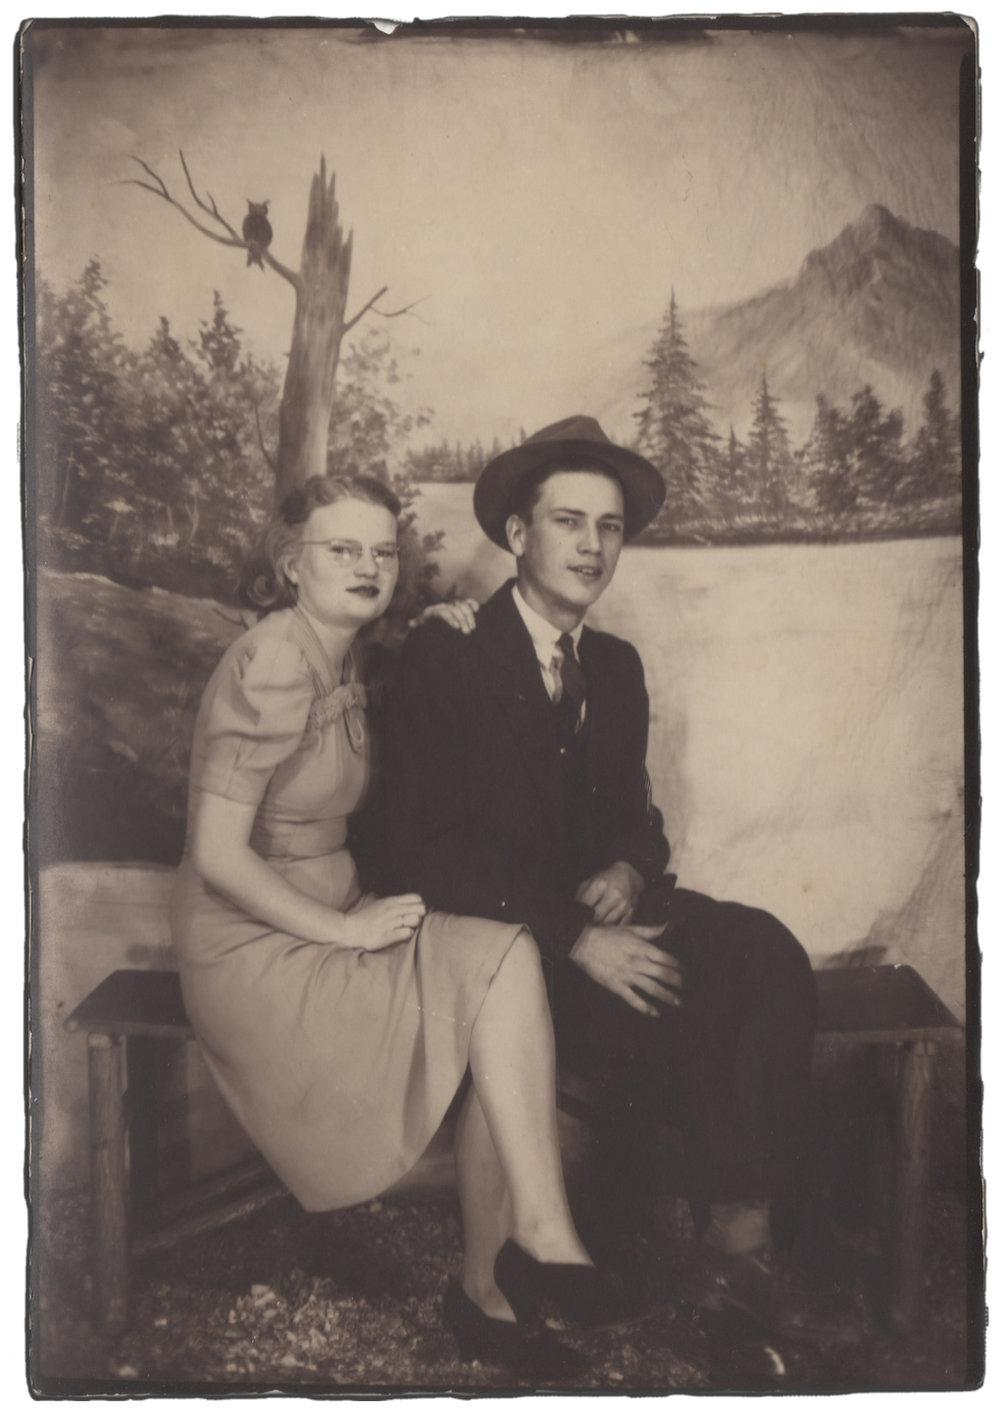 CLARENCE AND FLORA REECE, 1940